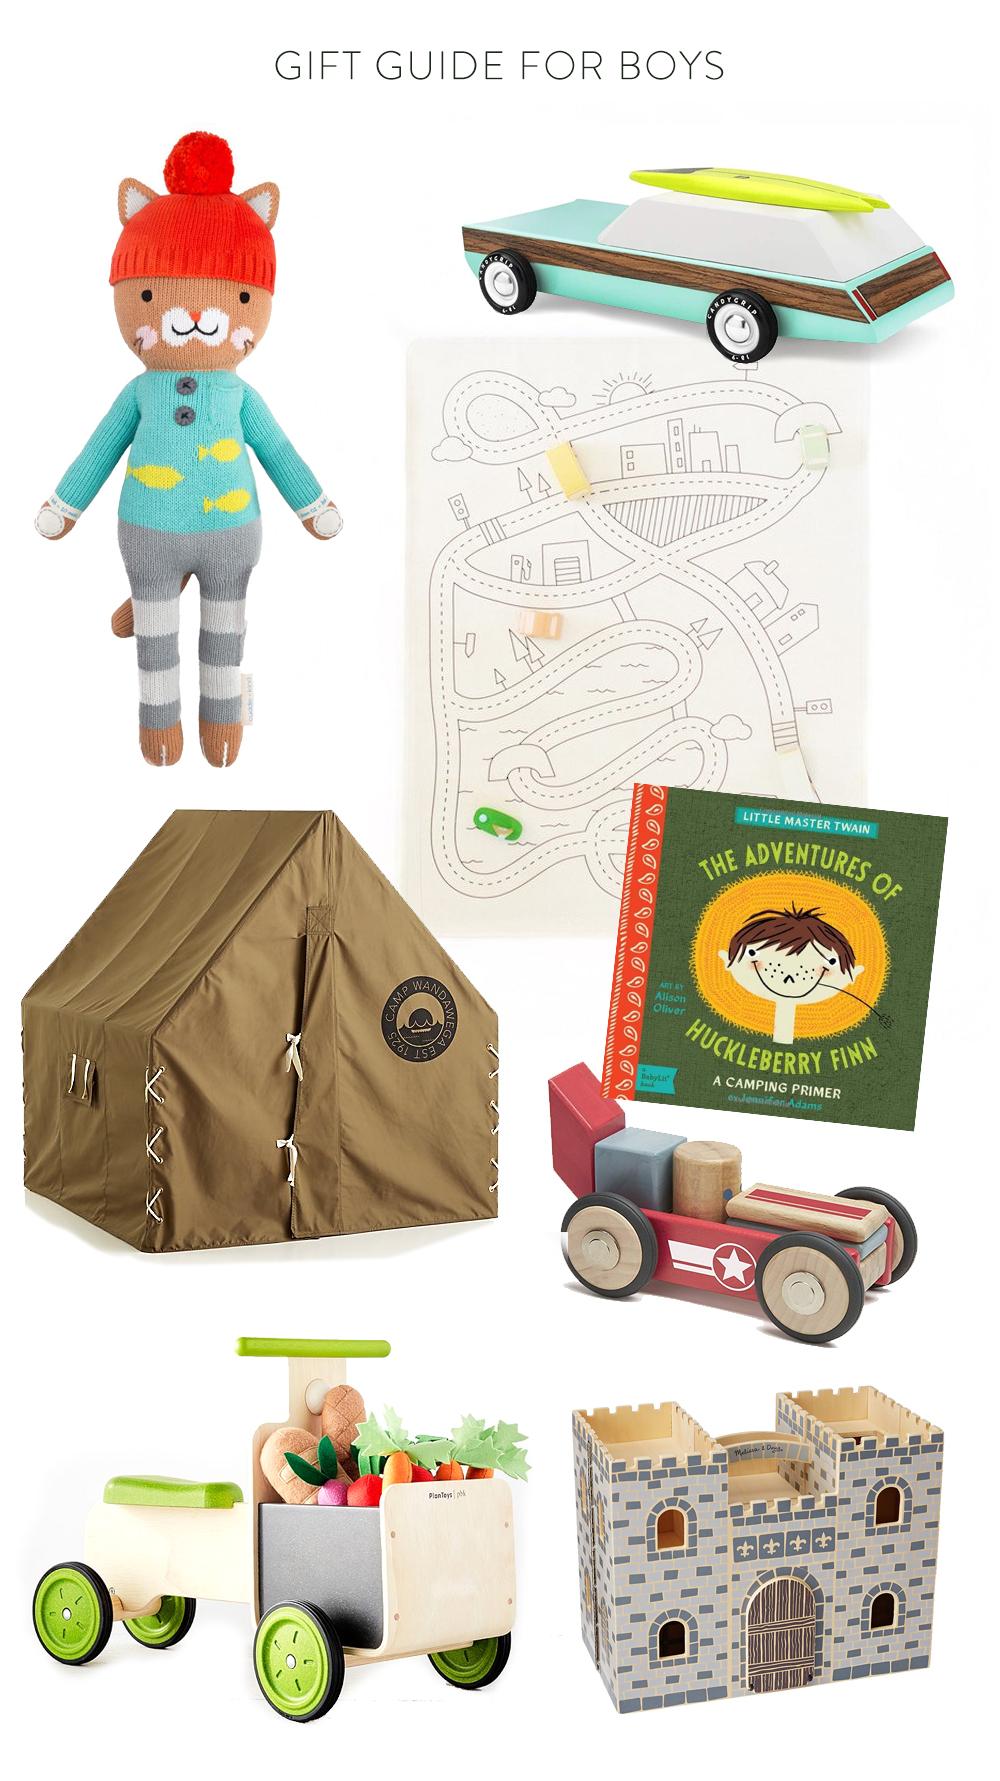 1.  Cuddle + Kind Cat  | 2.  Wooden Station Wagon  | 3.  Gathre Train Mat  | 4.  Huckleberry Finn Babylit Book  | 5.  Tegu block car  | 6.  Wood Castle  | 7.  Farmer's Market Ride-On Truck  | 8.  Explorer Tent